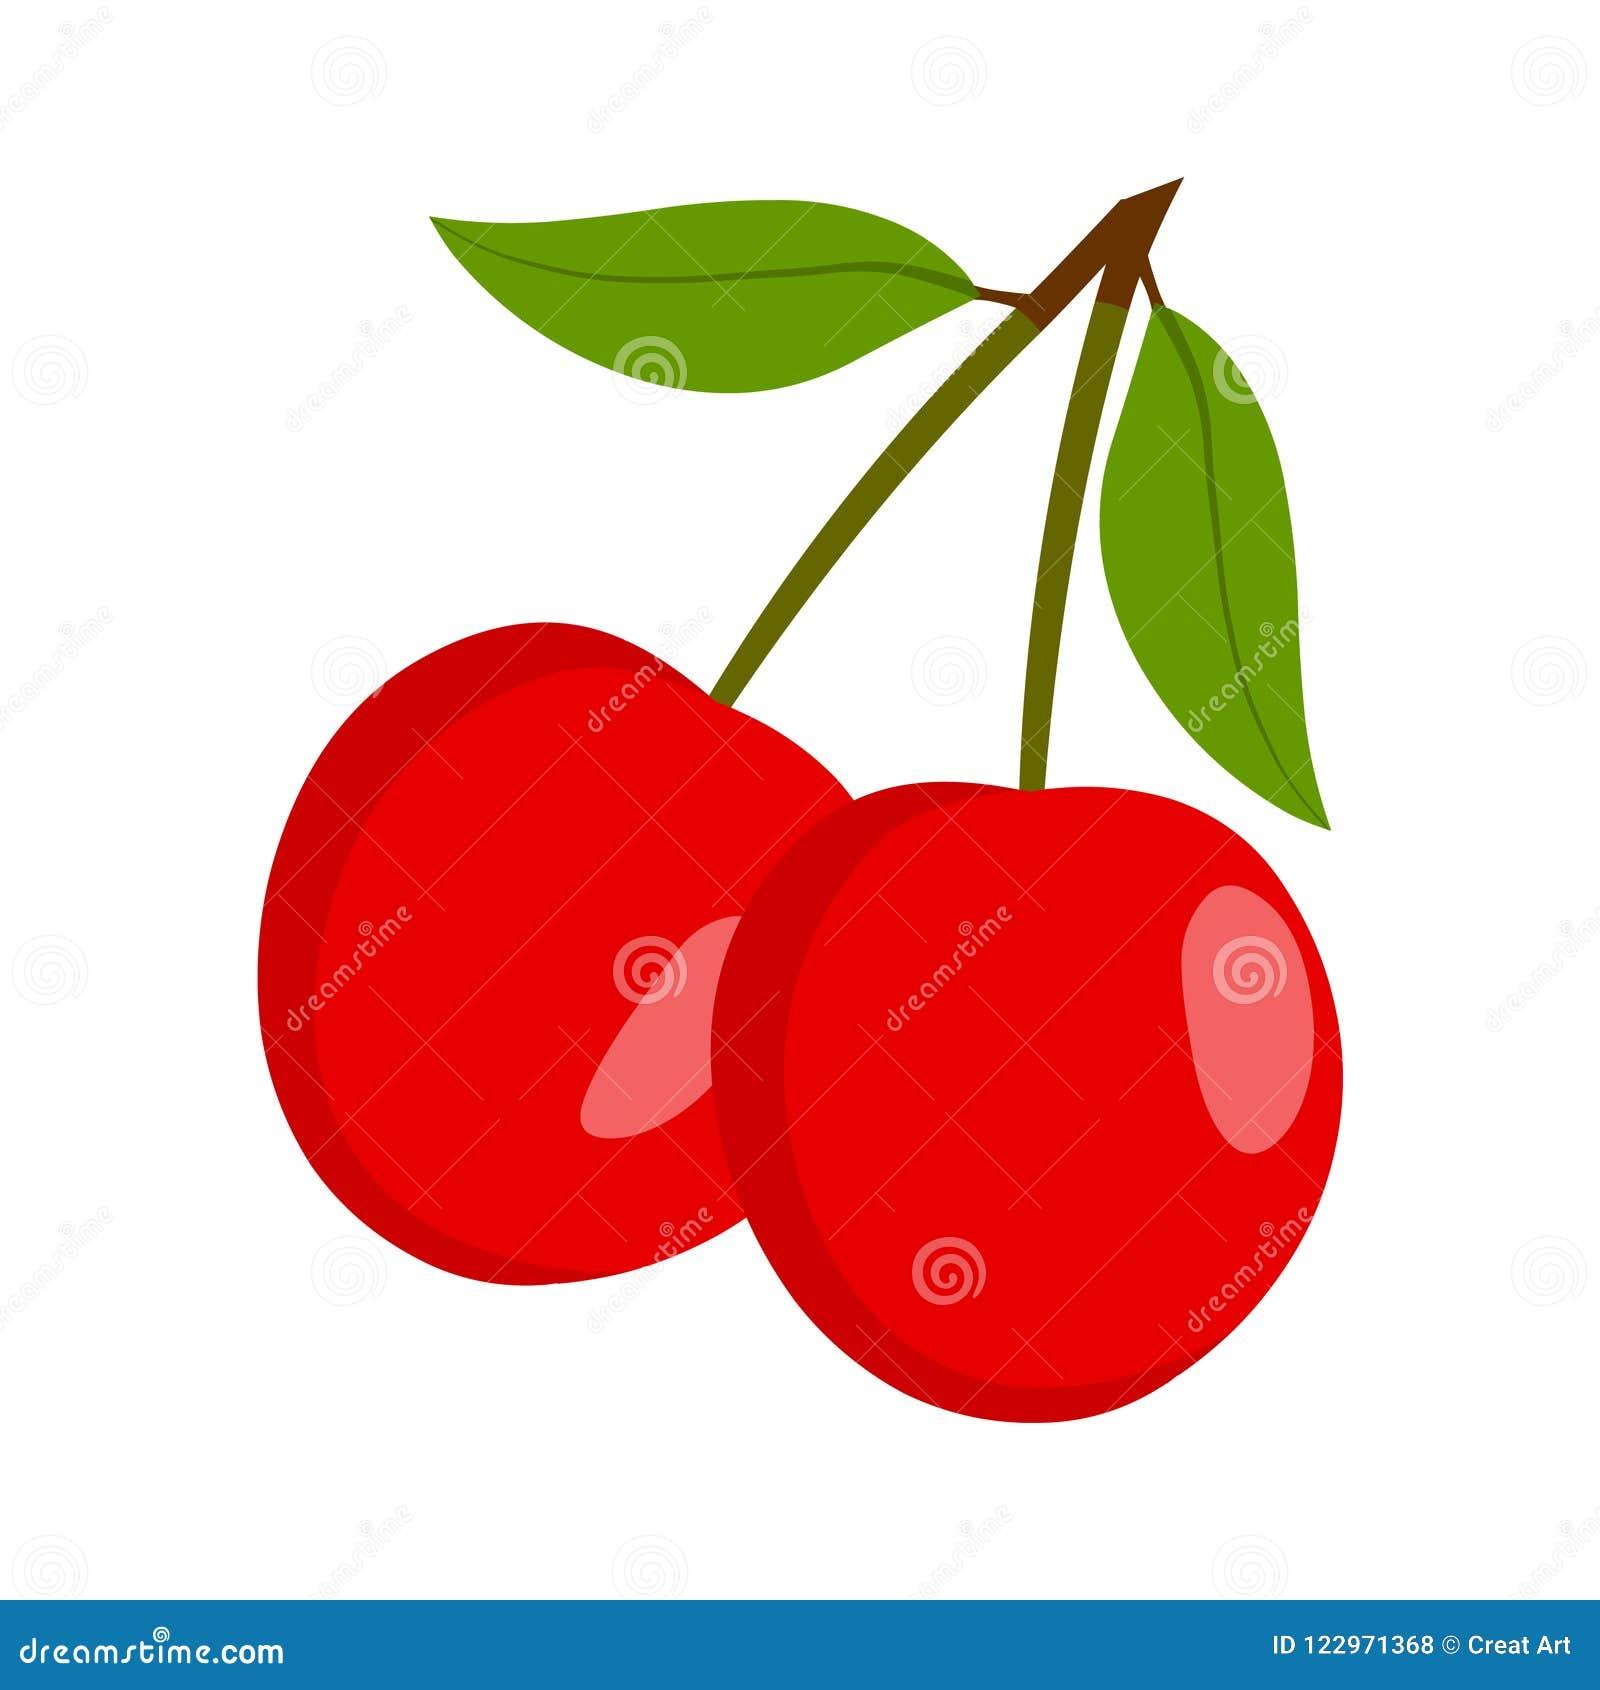 Cherry vector.Fresh cherry illustration